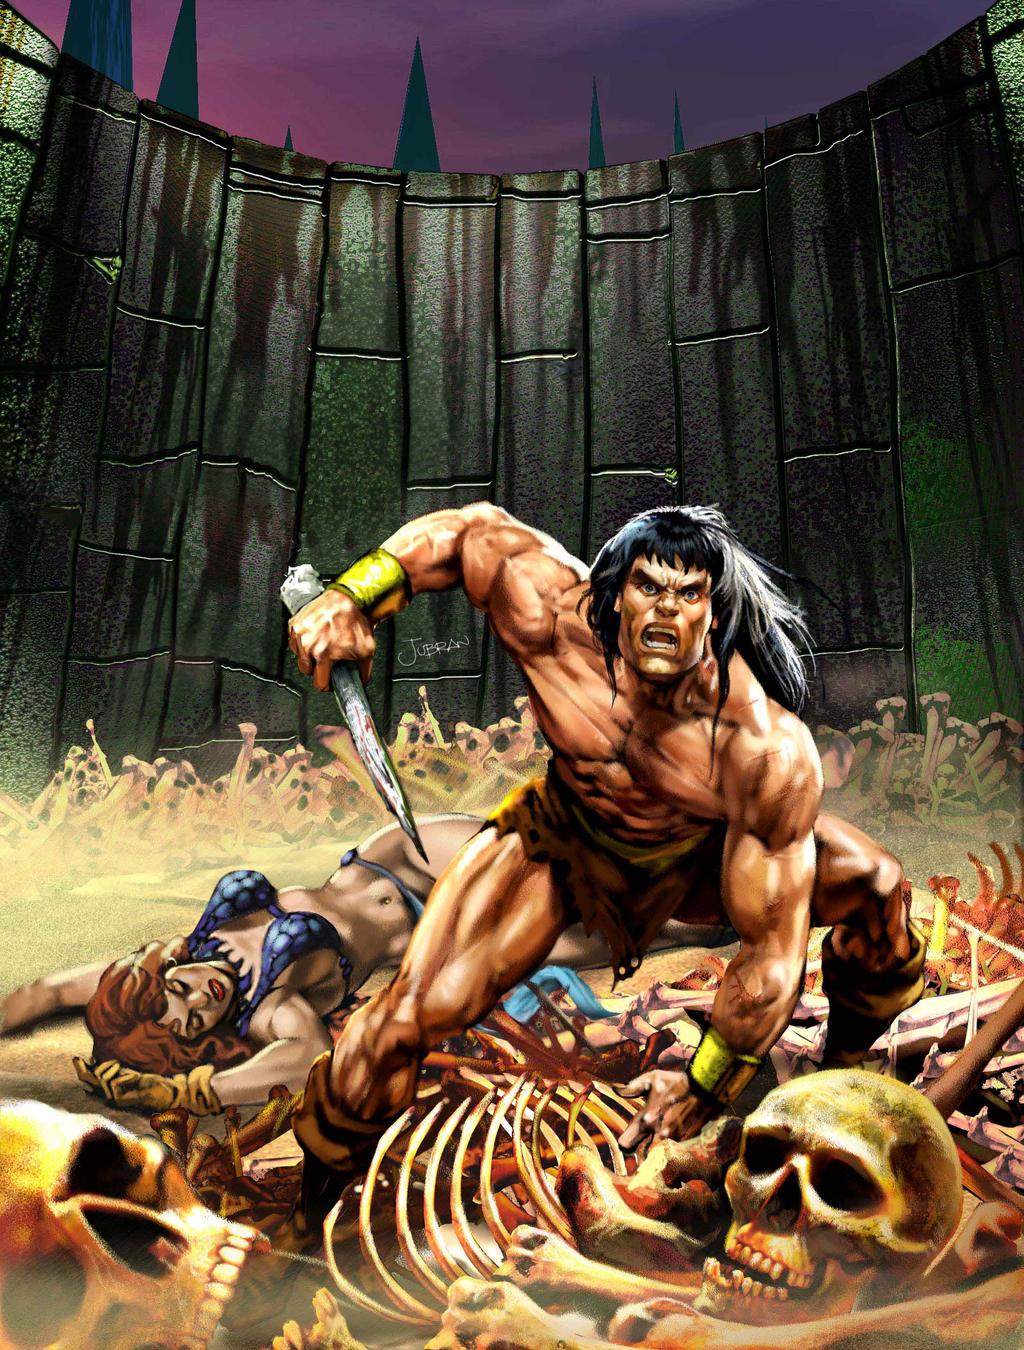 Conan the barb by Jubran